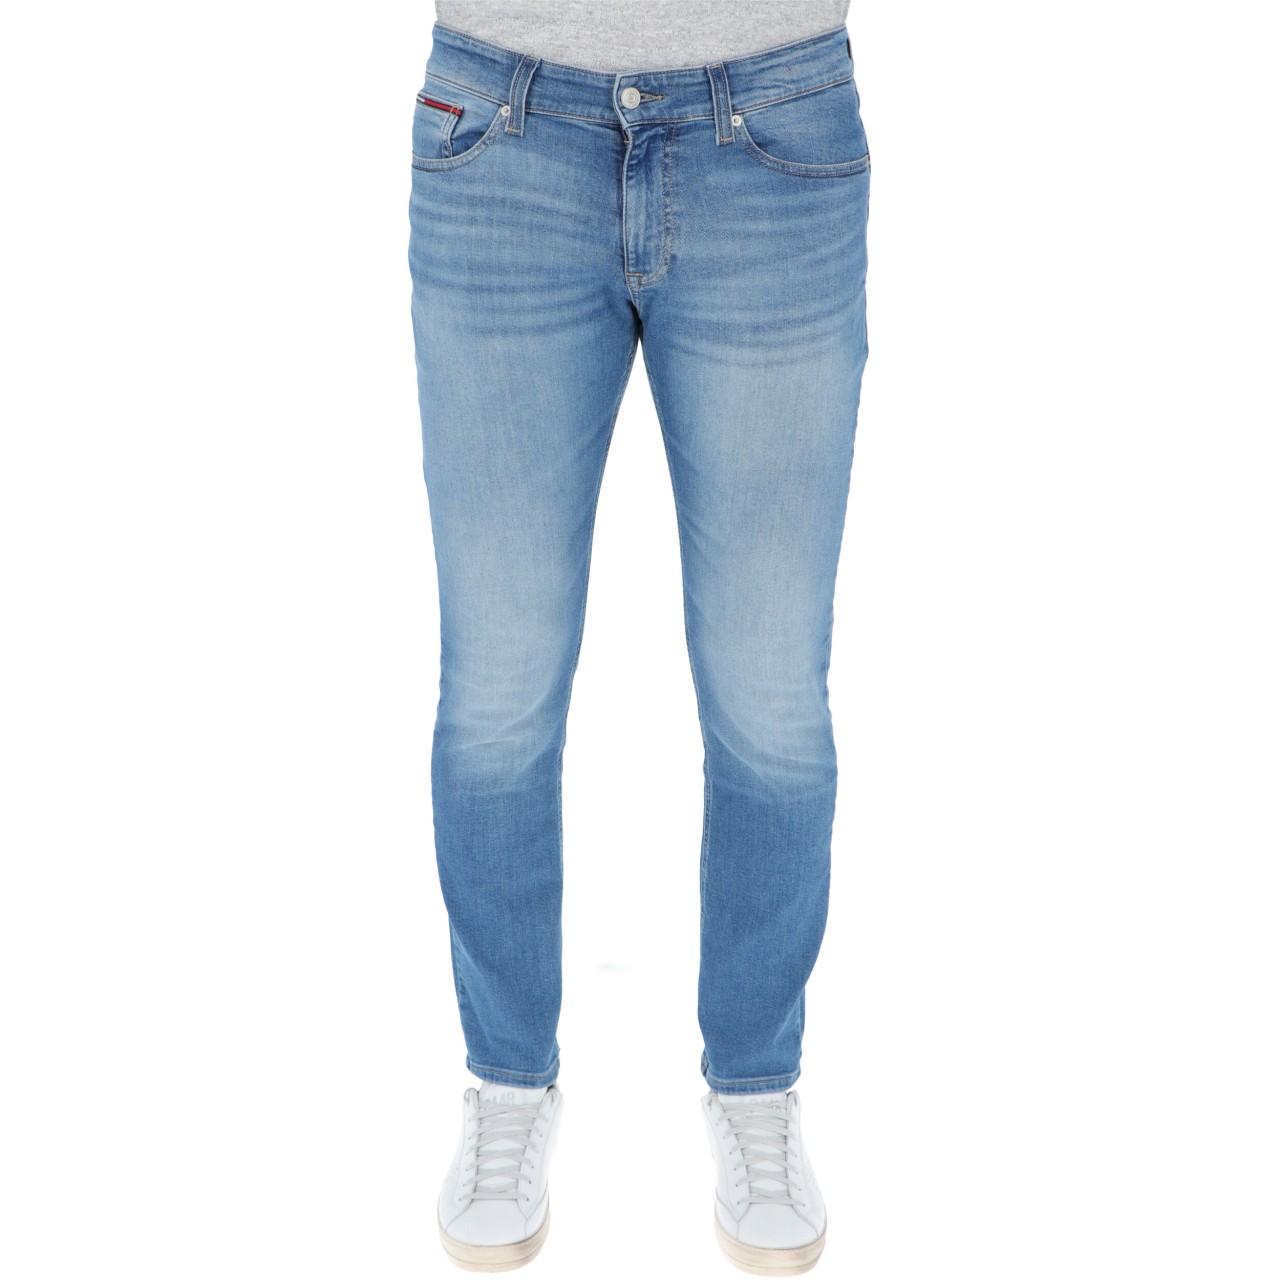 Tommy hilfiger Uomo Jeans Tommy Hilfiger Jeans Uomo Scanton Slim Ae L32 10788Q